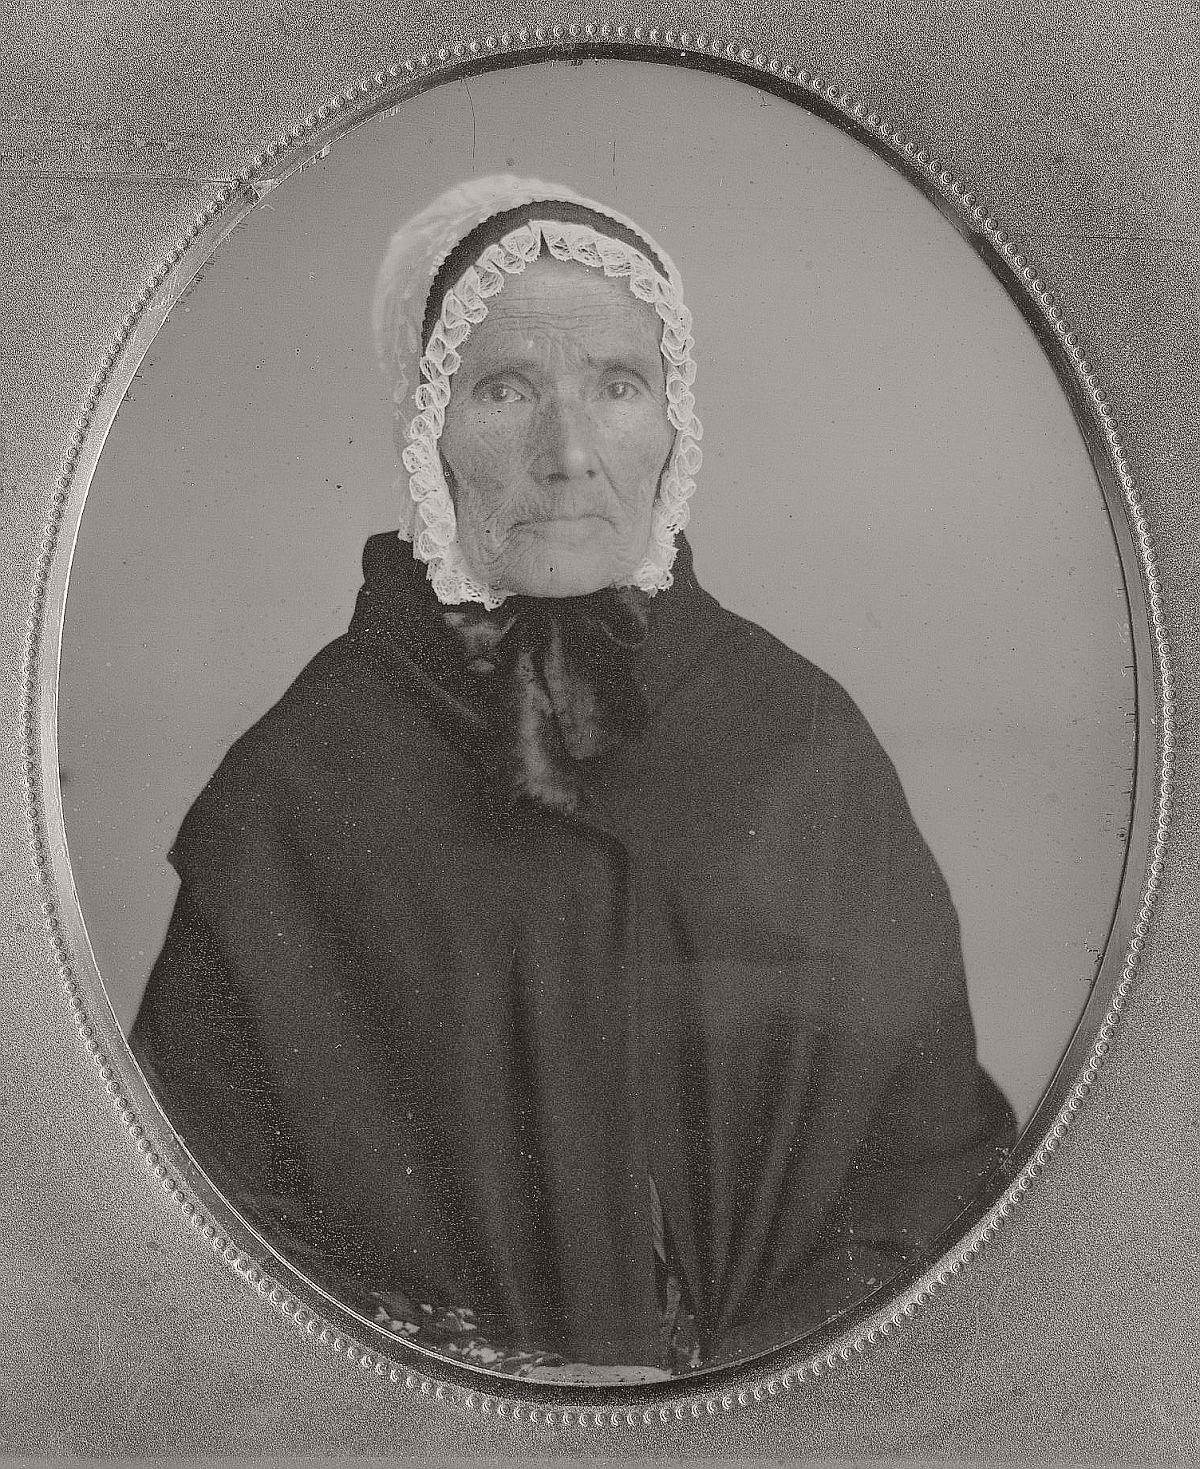 daguerreotype-portrait-ladies-born-in-the-late-18th-century-1700s-vintage-24